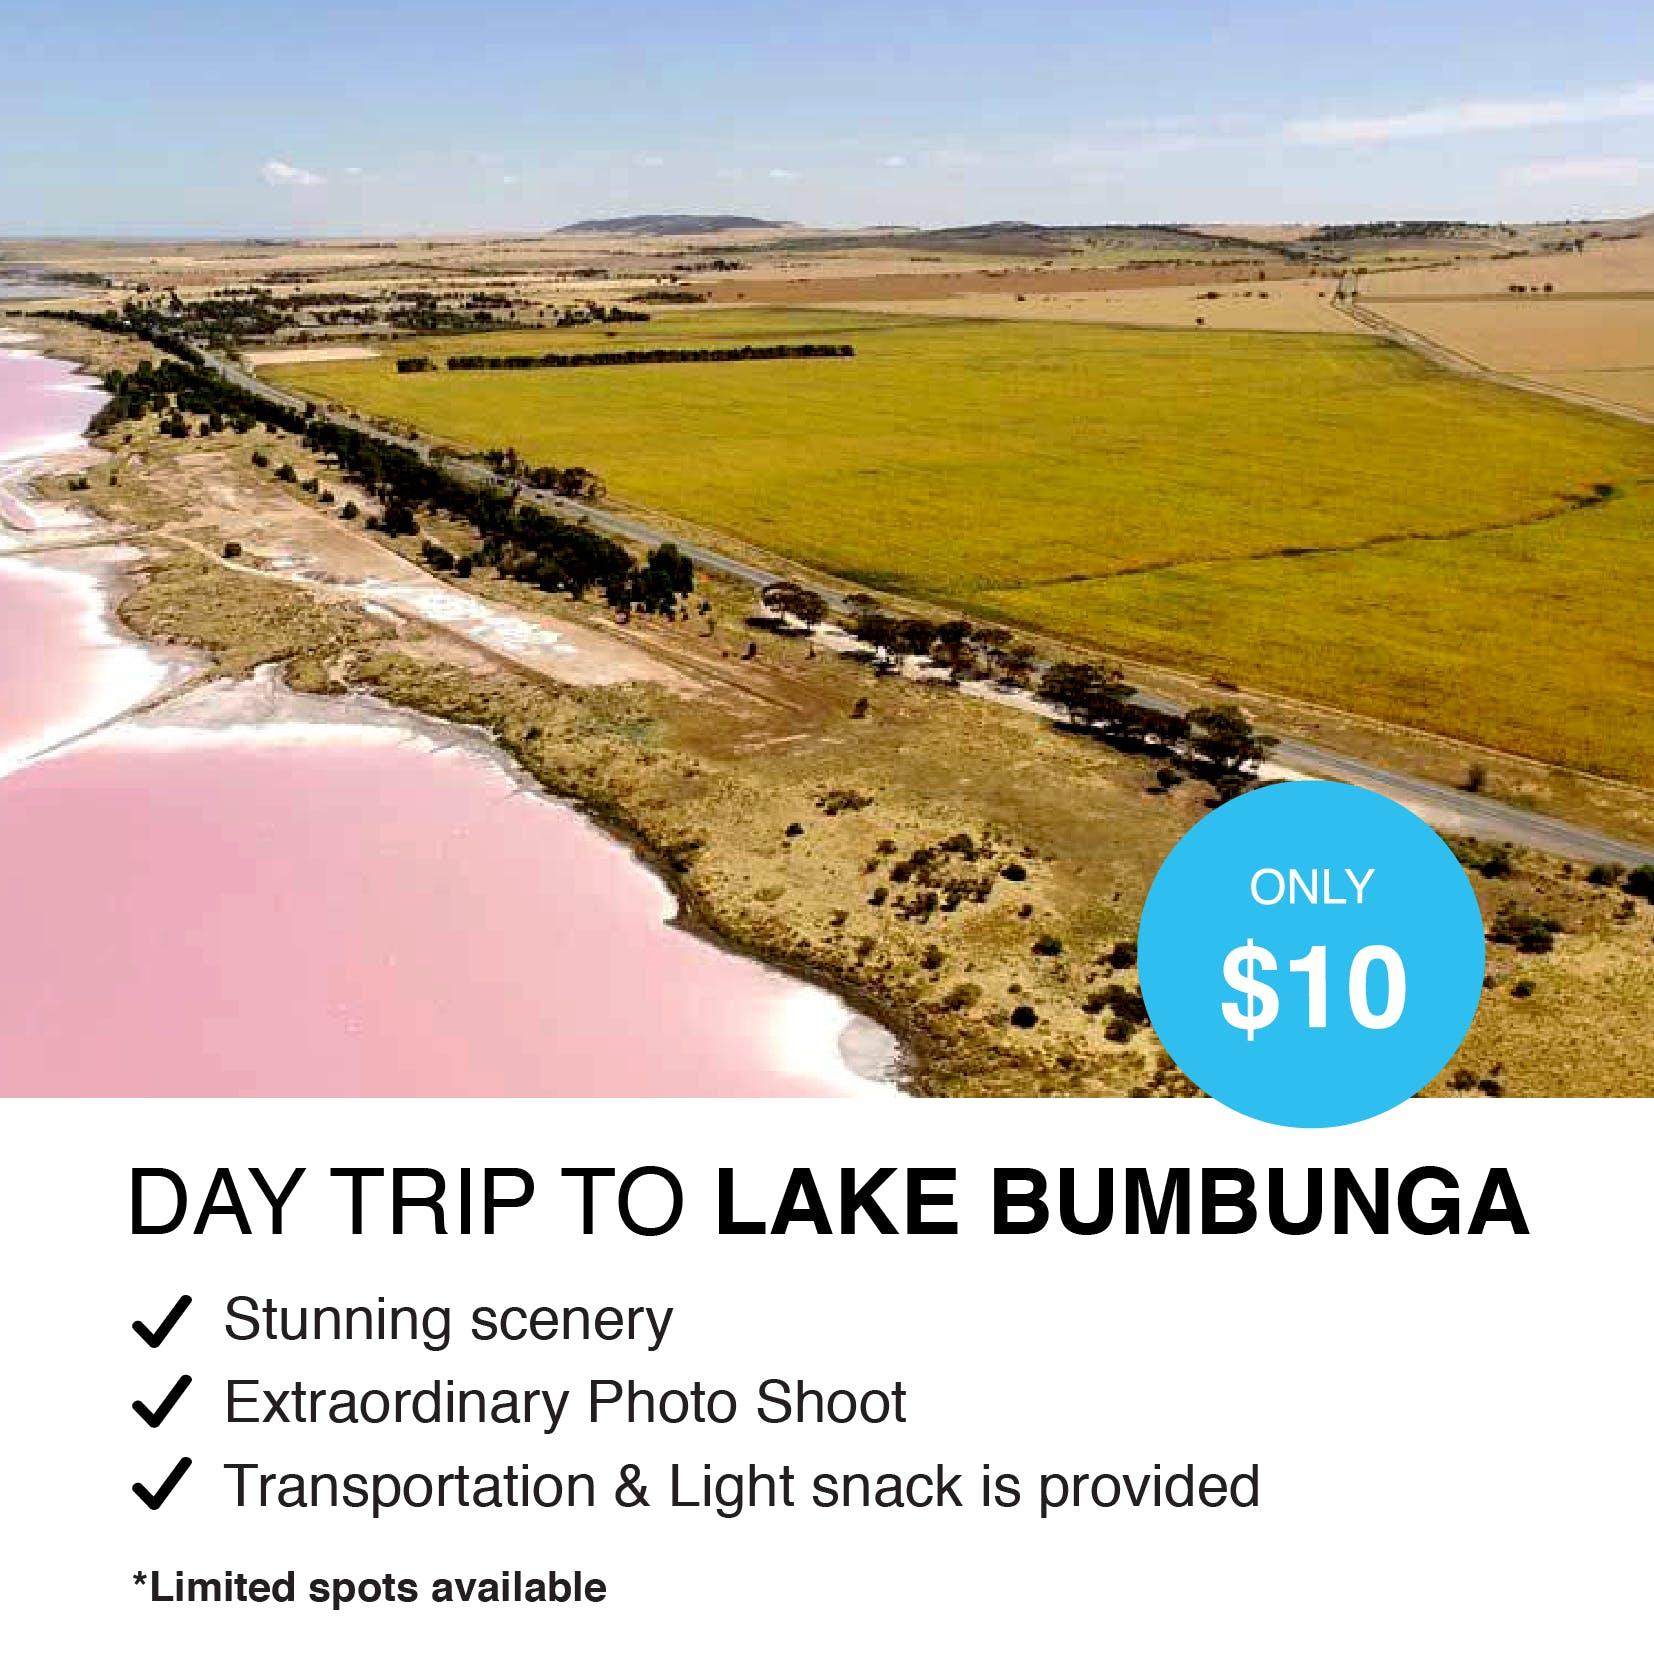 Day Trip to Lake Bumbunga with AUG!